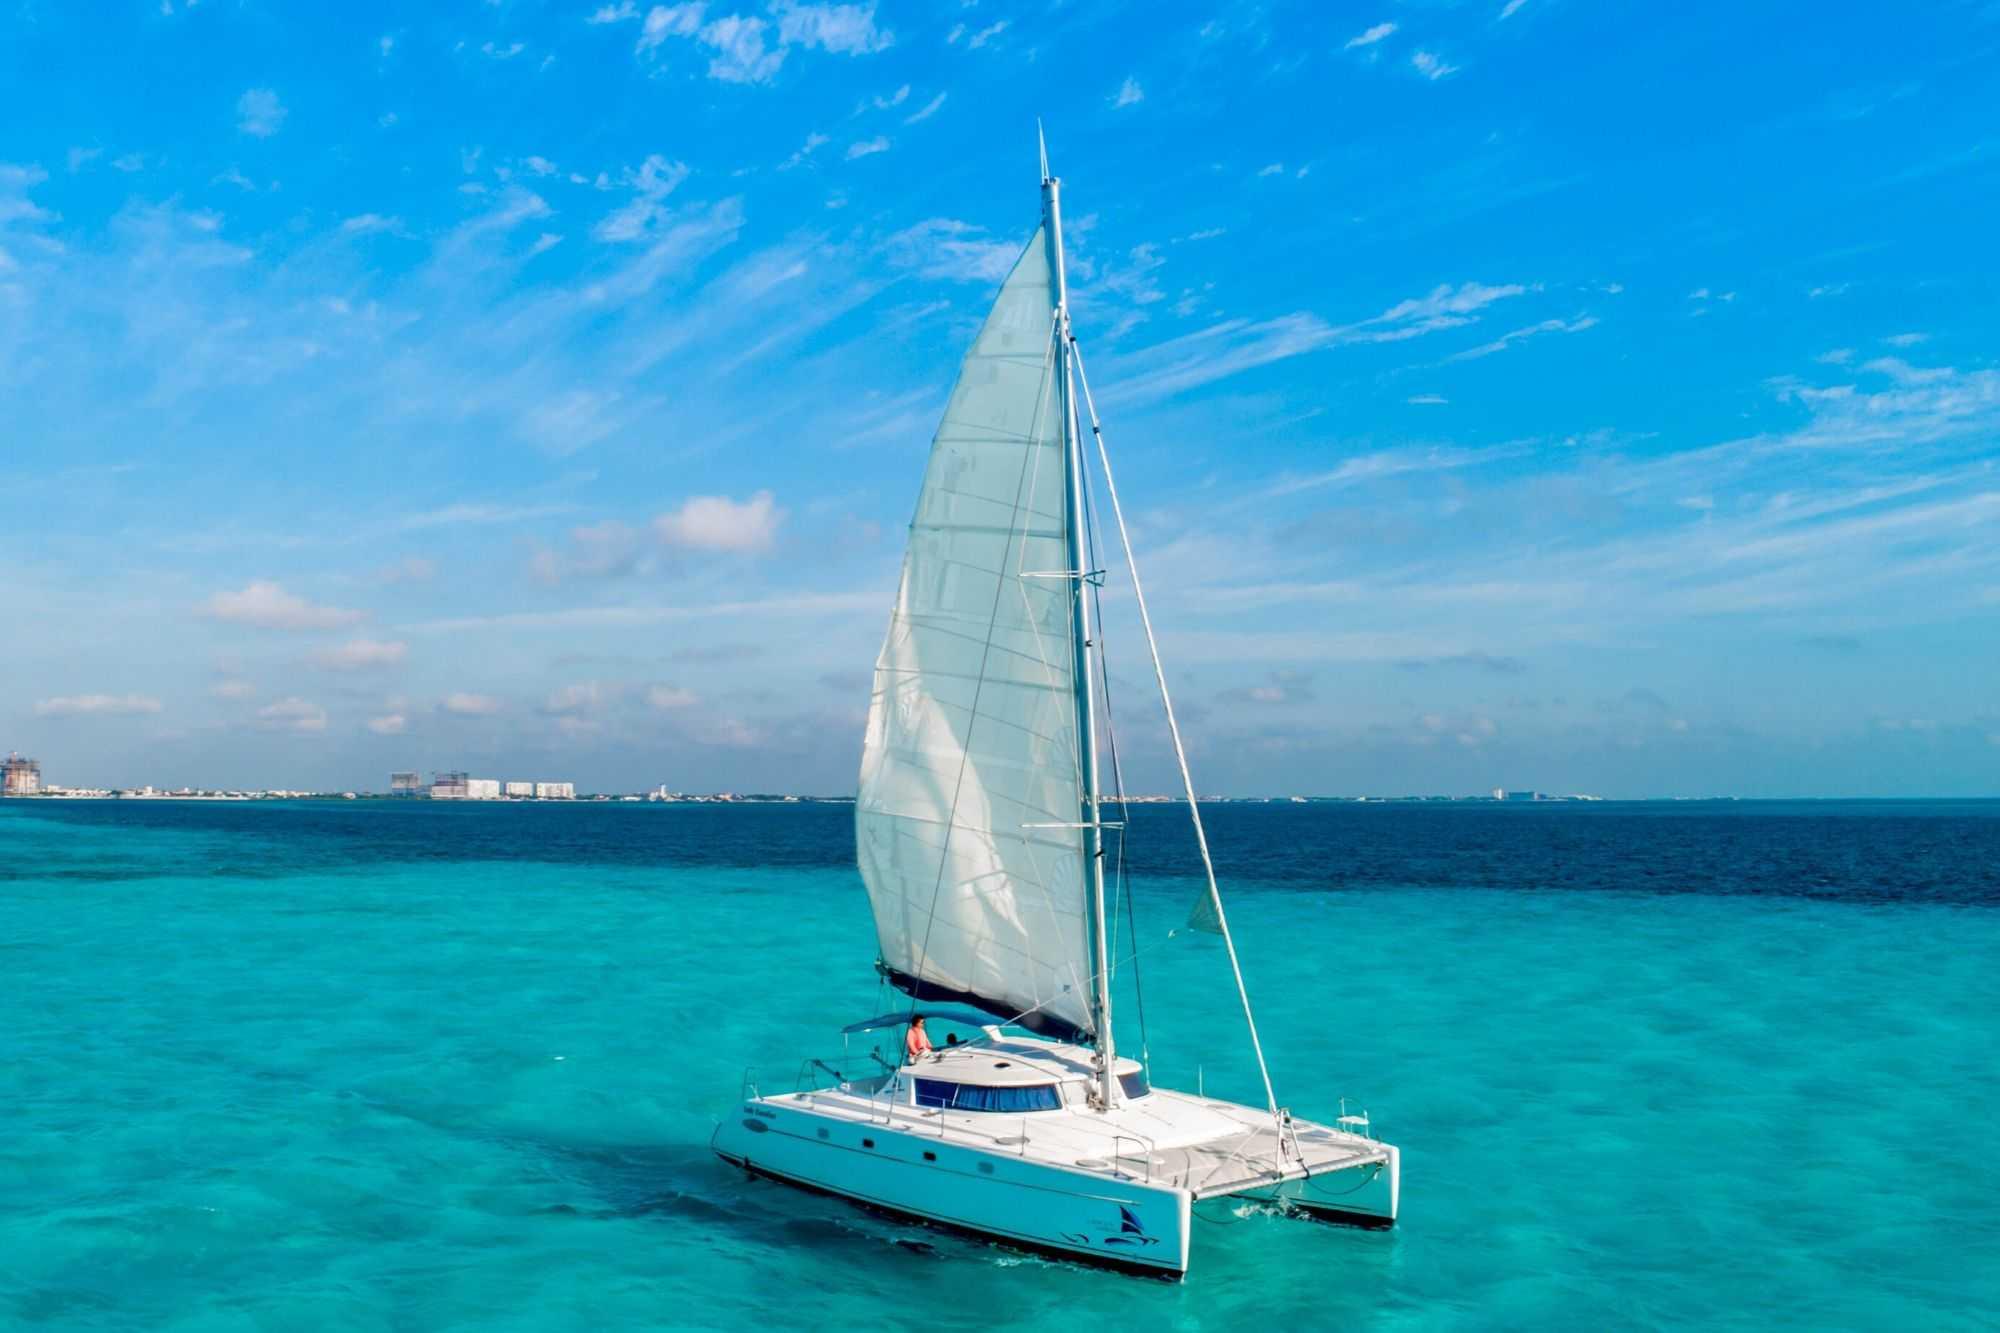 Lady Caroline - Isla Mujeres Catamaran Tour - Cancun Sailing - 7